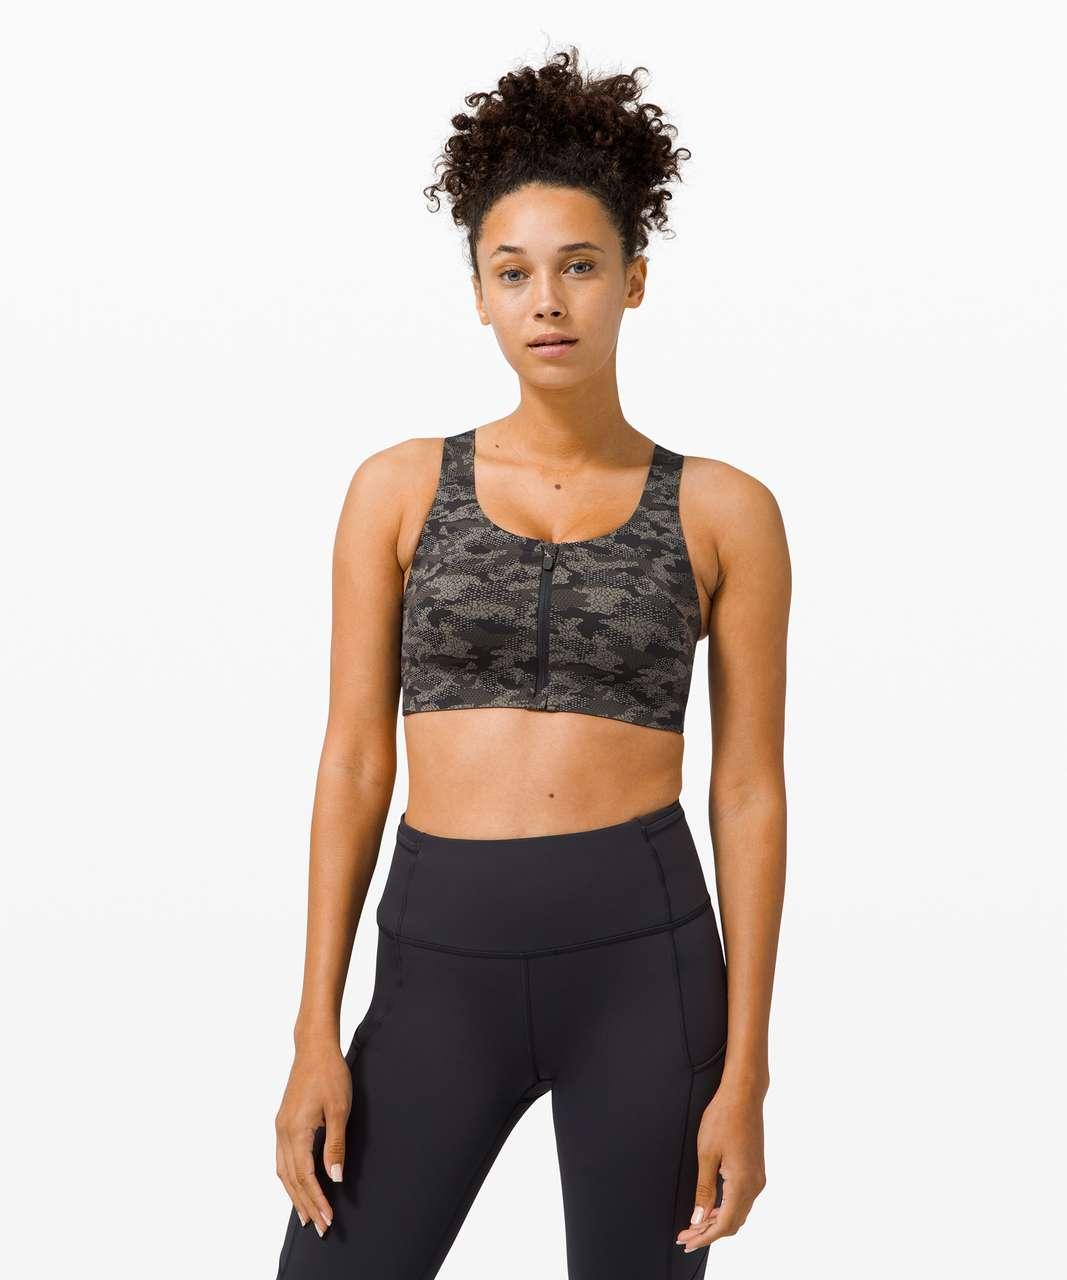 Lululemon Enlite Bra Zip Front *High Support, A–E Cups - Collage Camo Mini Black Multi